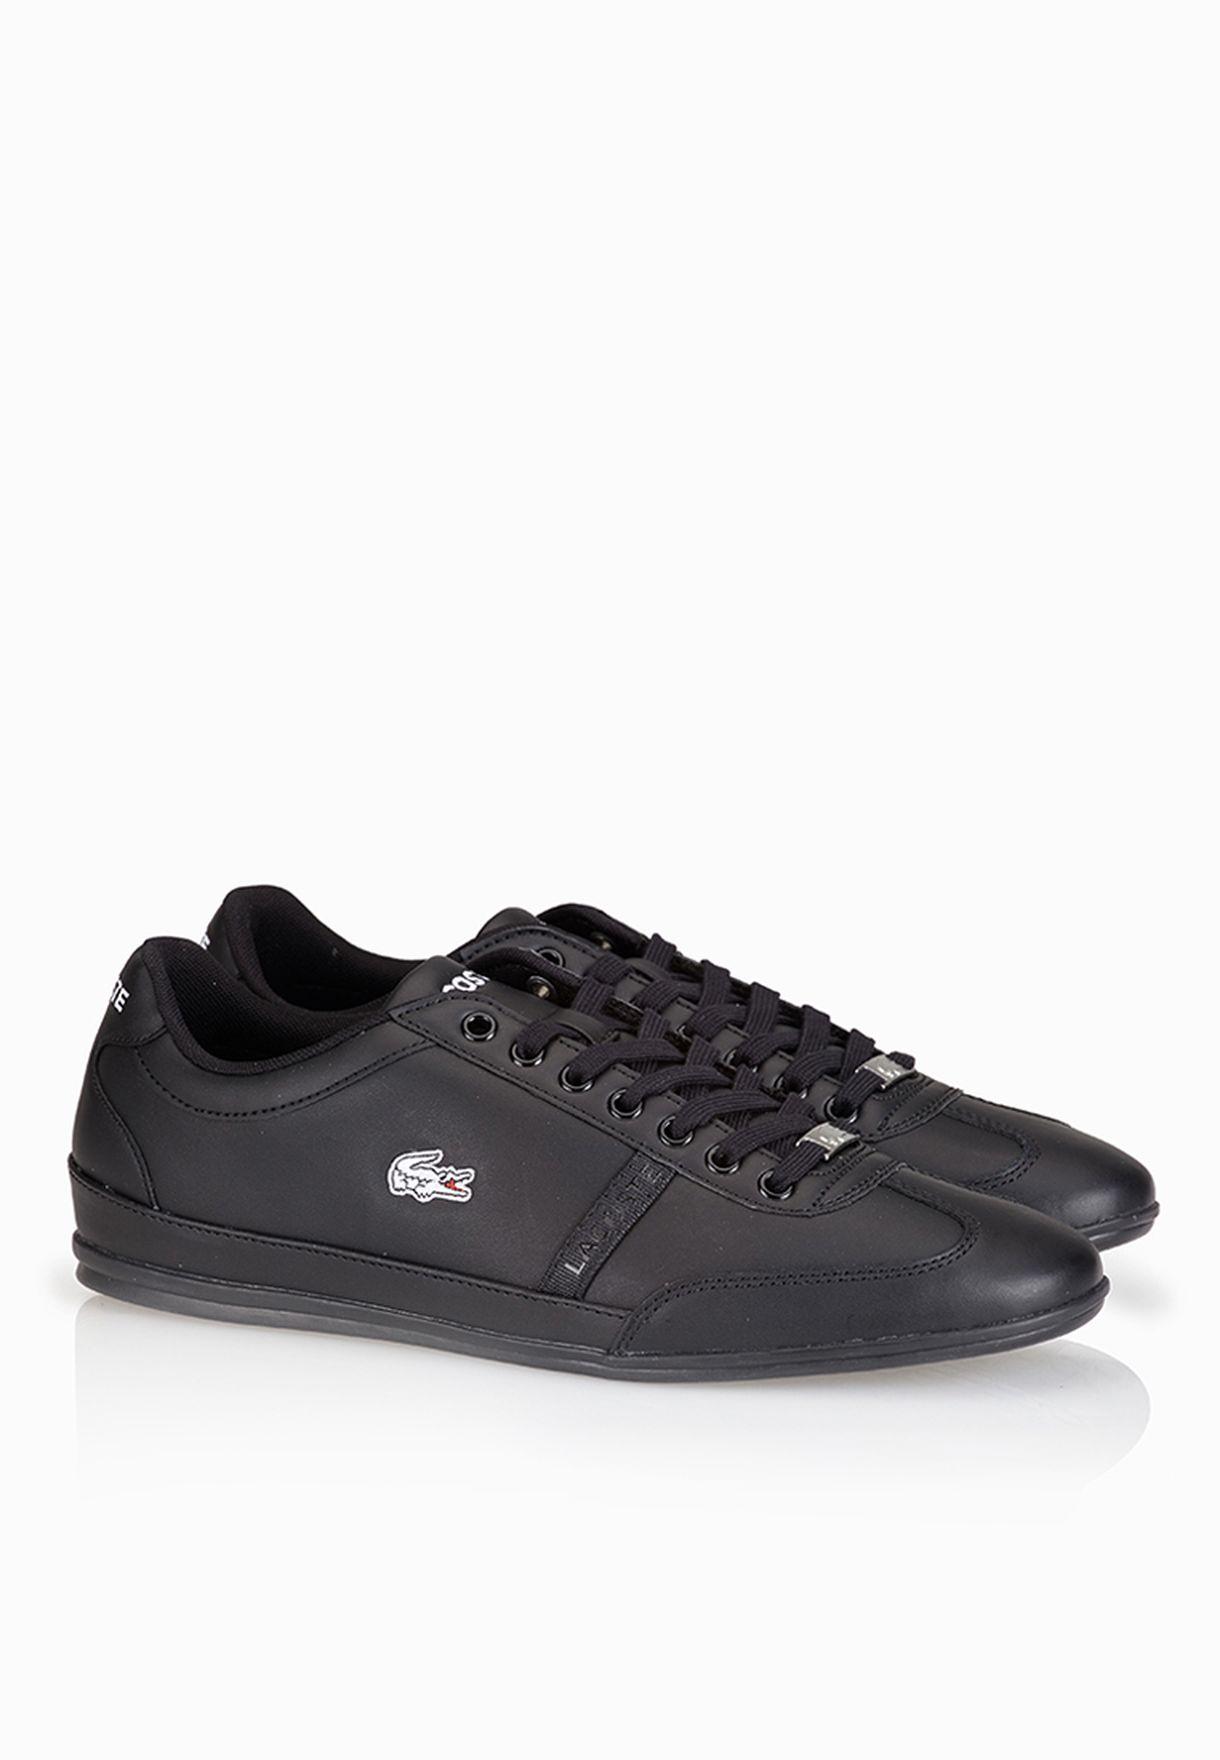 b1f2c6a38 Shop Lacoste black Misano Sport SCY Sneakers 29SPM0040-02H for Men ...